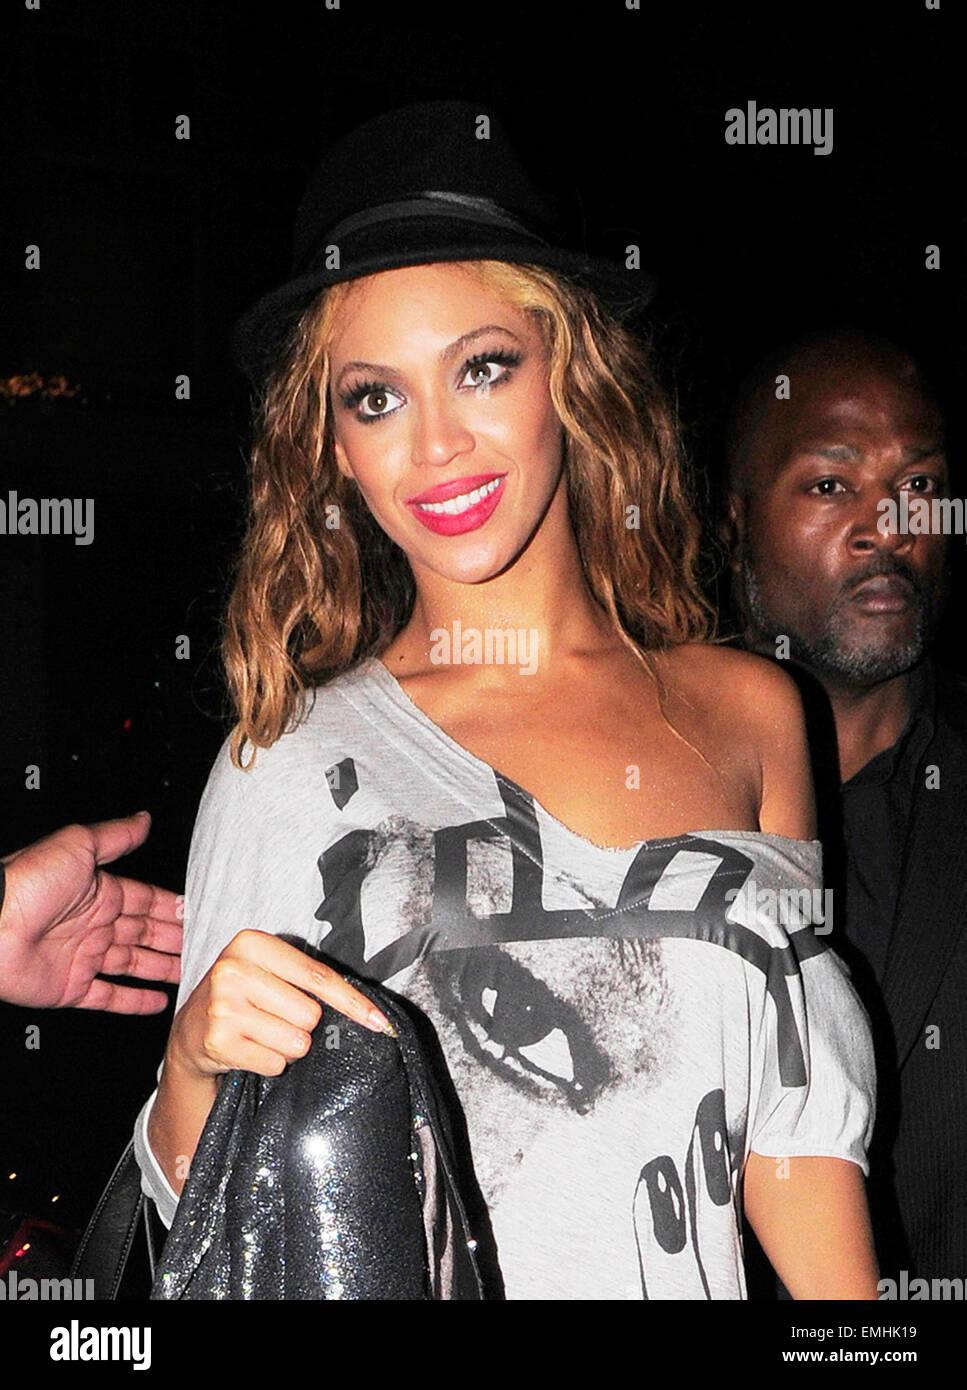 16 london pop diva beyonce leaving mahiki club stock photo royalty free image - Beyonce diva download ...